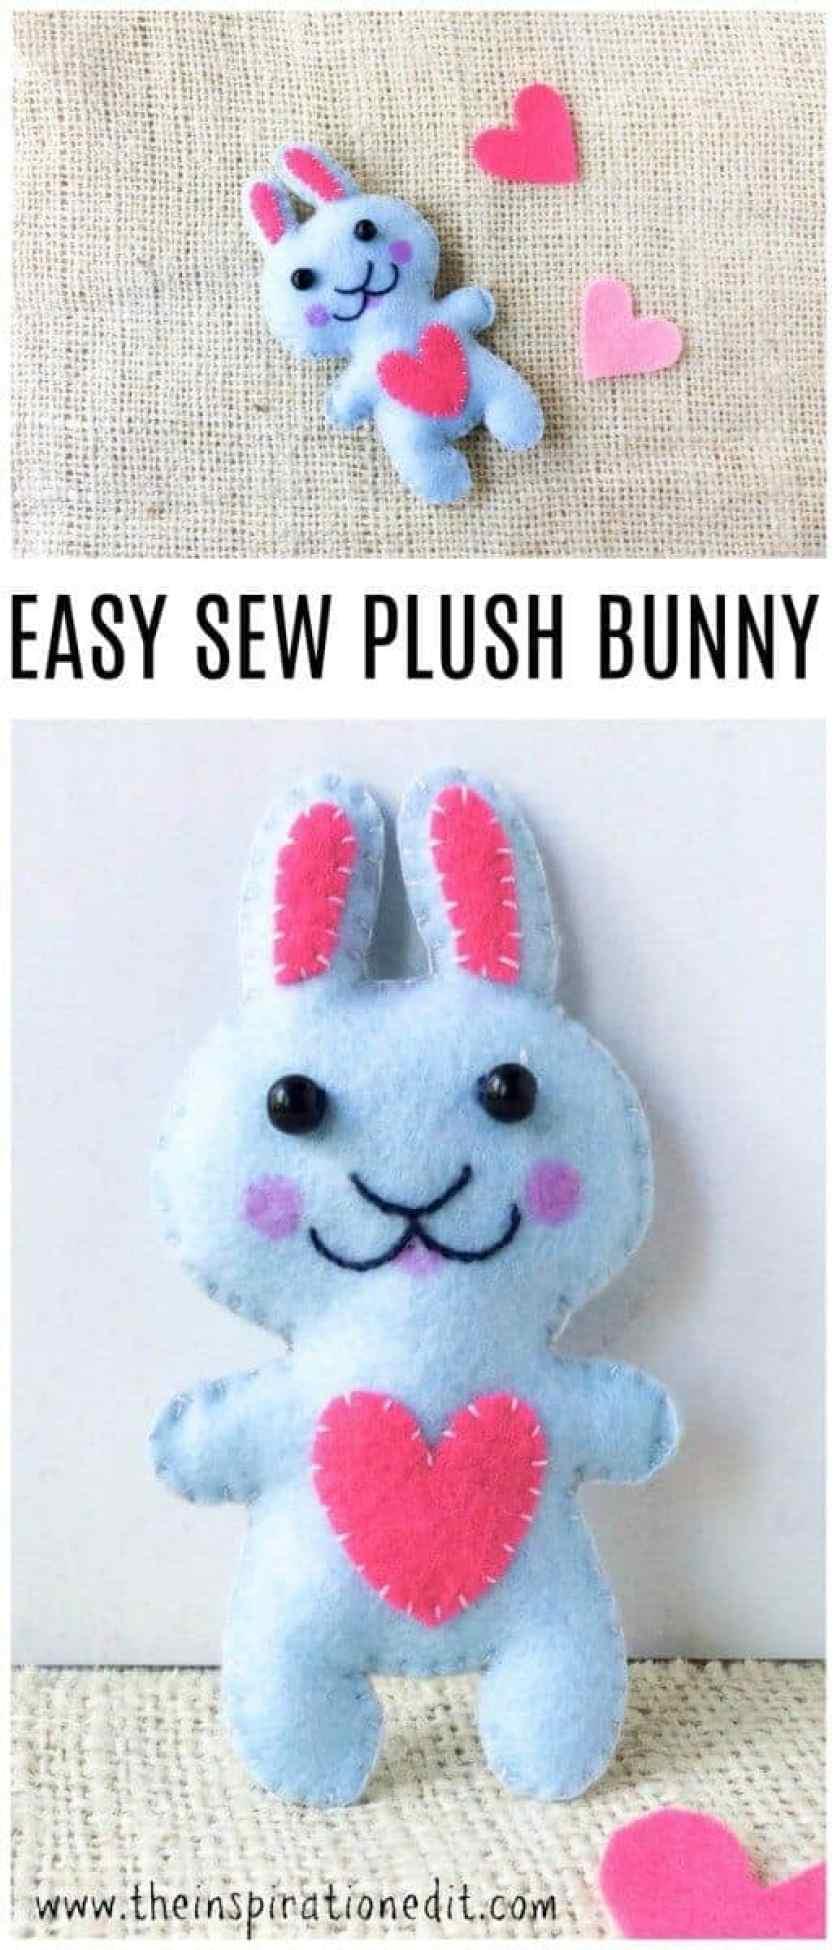 easy sew plush bunny